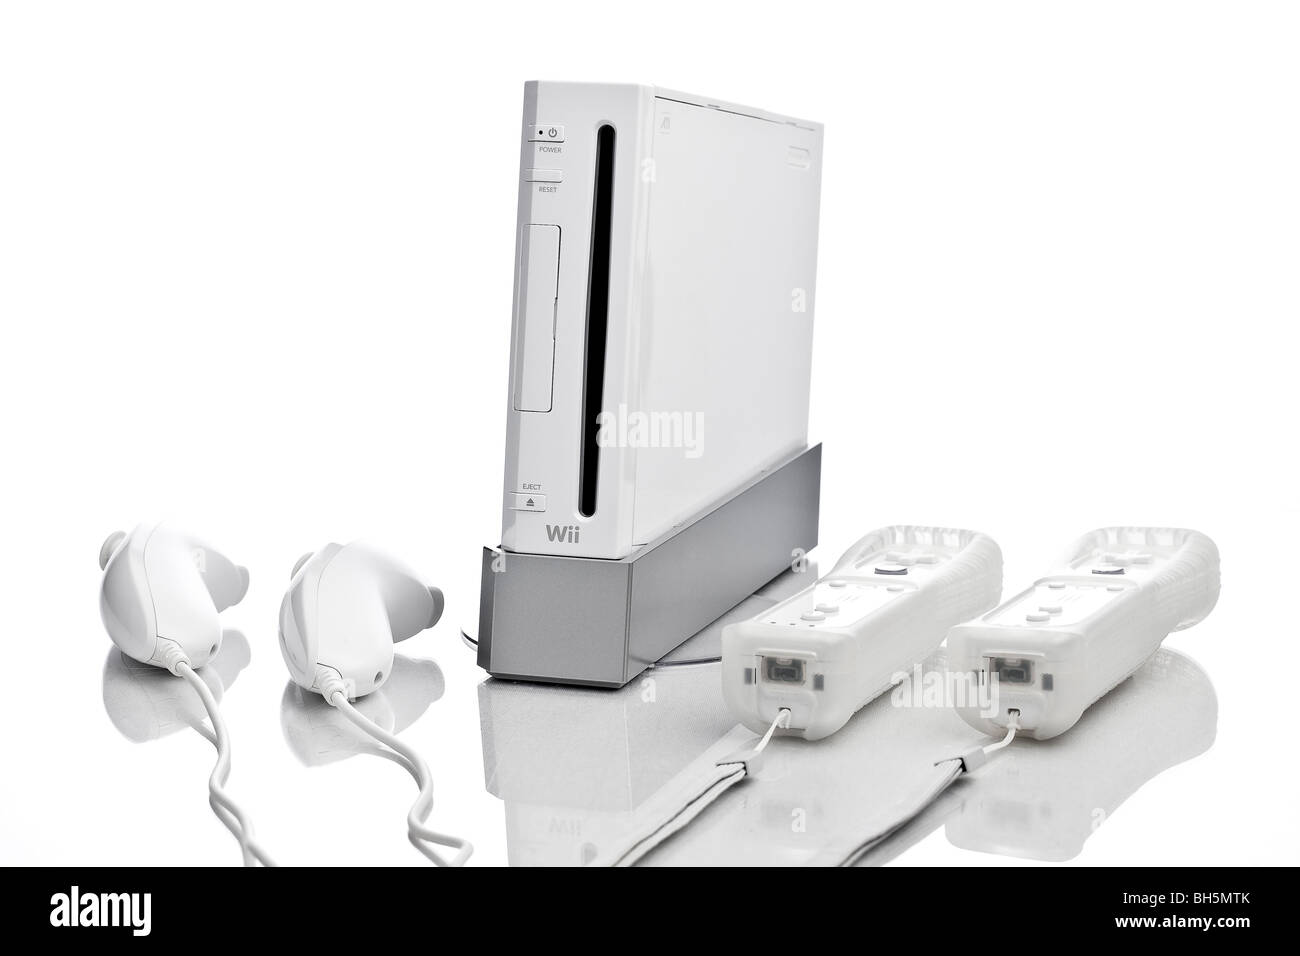 Nintendo Wii Stockfotos & Nintendo Wii Bilder - Alamy